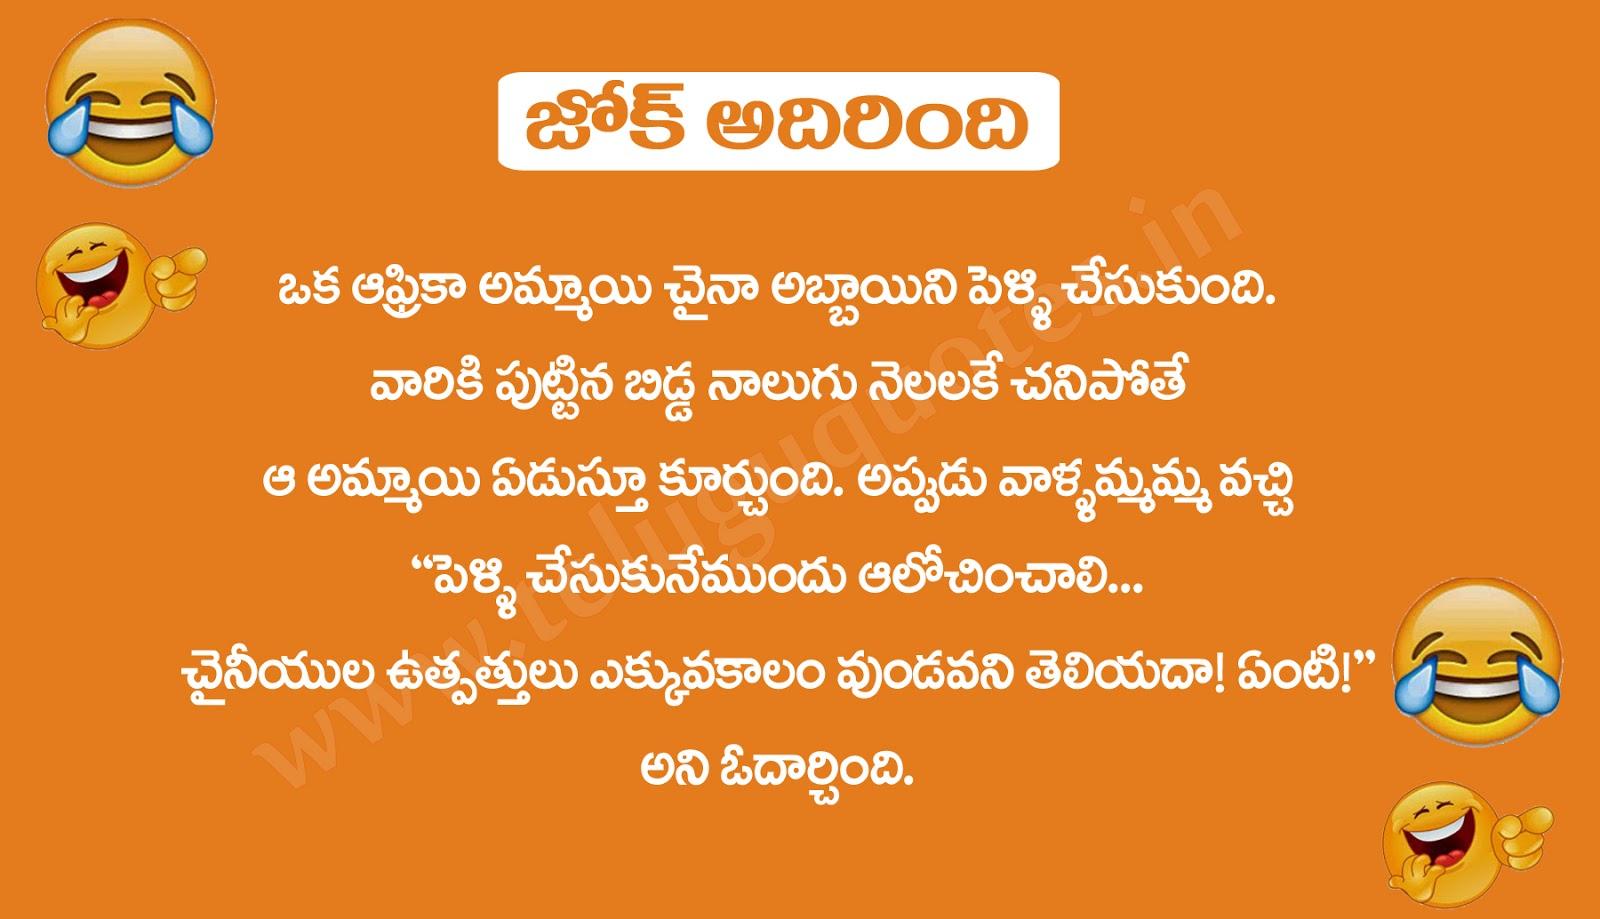 Telugu Funny Jokes Telugu Quotes